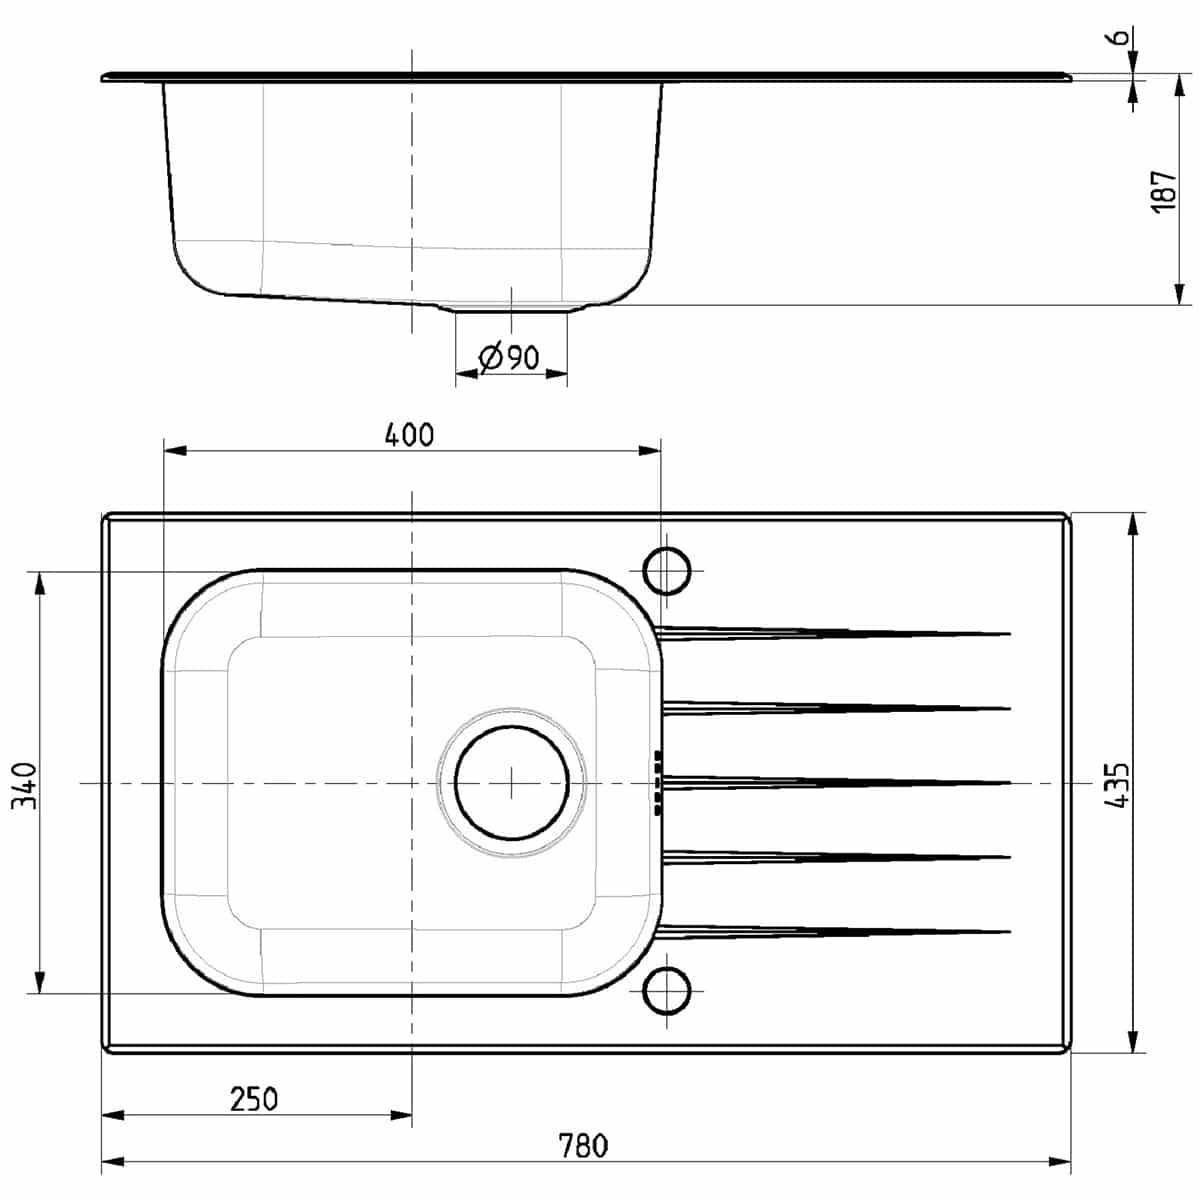 Tehnički crteži kuhinjske sudopere Alveus Vitro 20